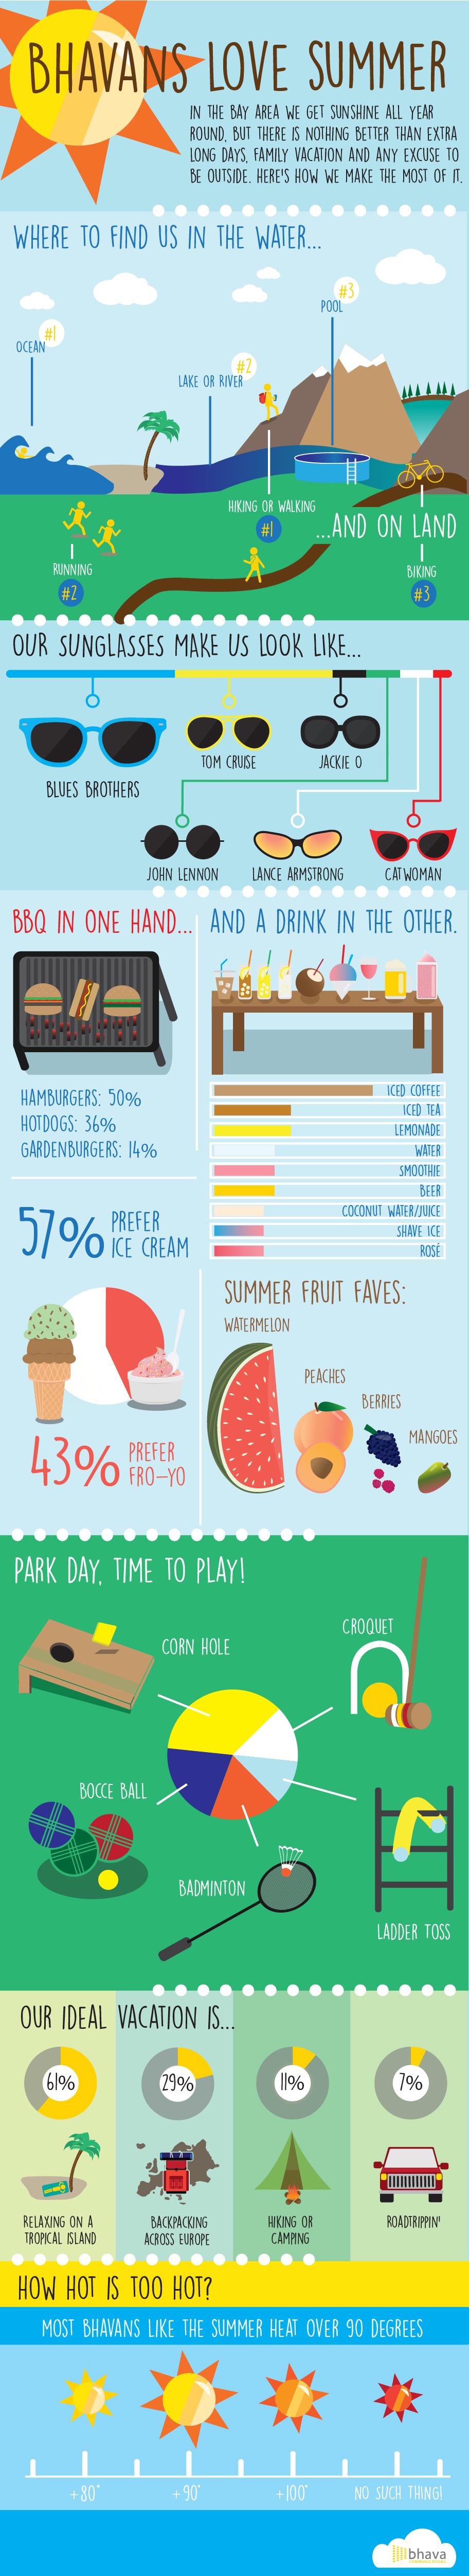 Bhava SummerSurvey Infographic _final smaller-01-01-01